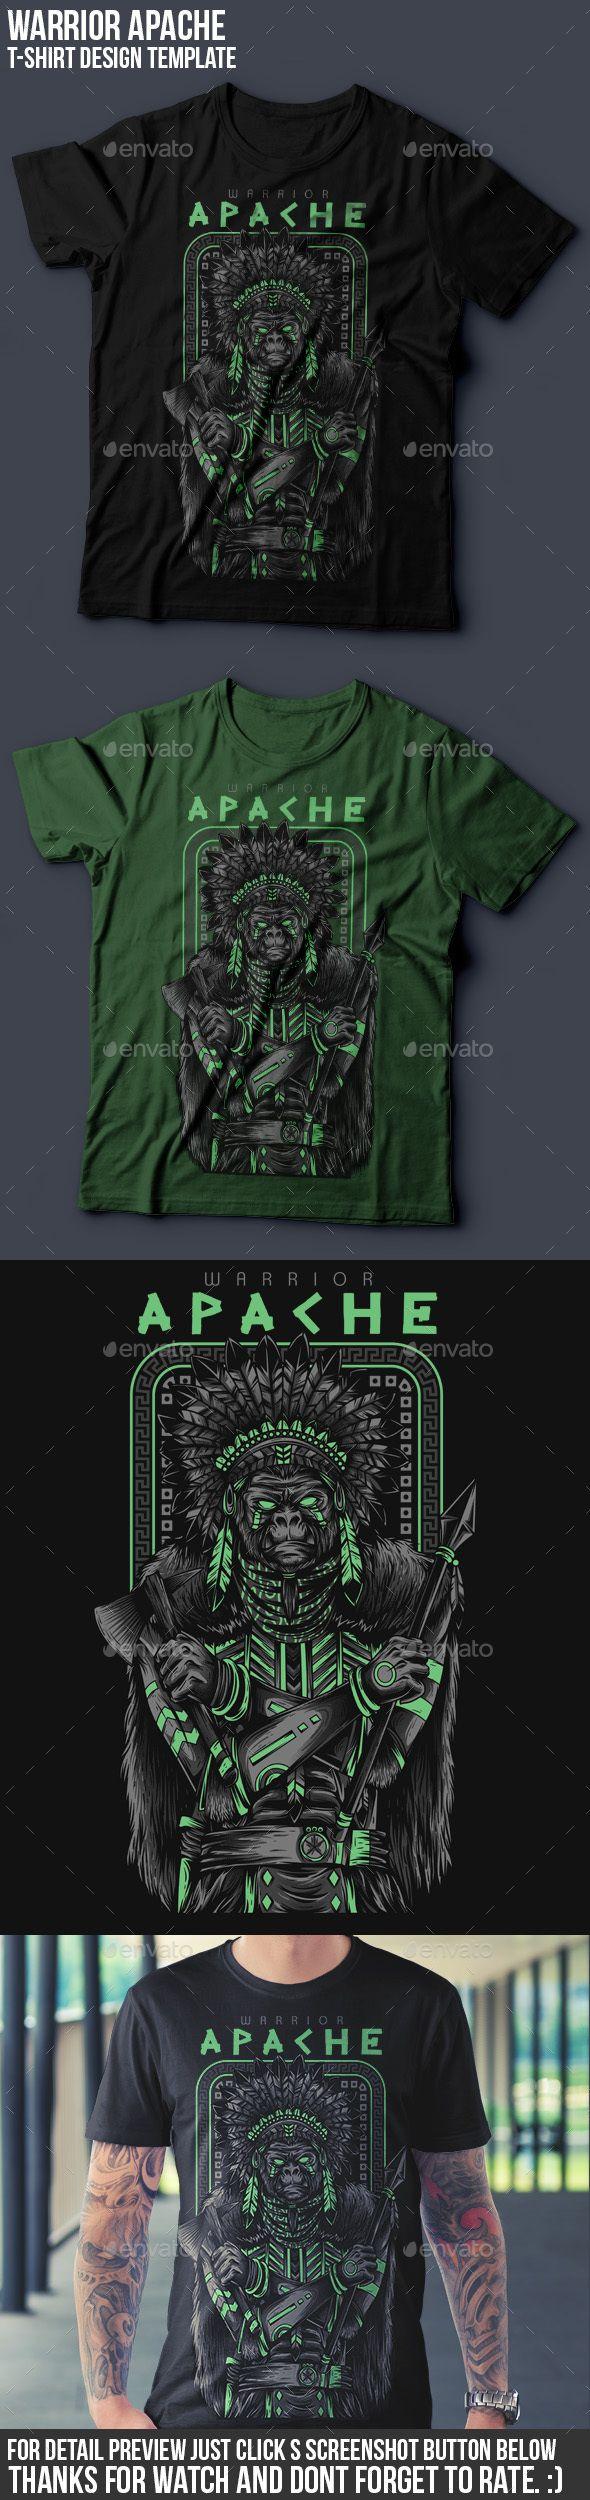 Shirt design generator online - Apache Warrior T Shirt Design